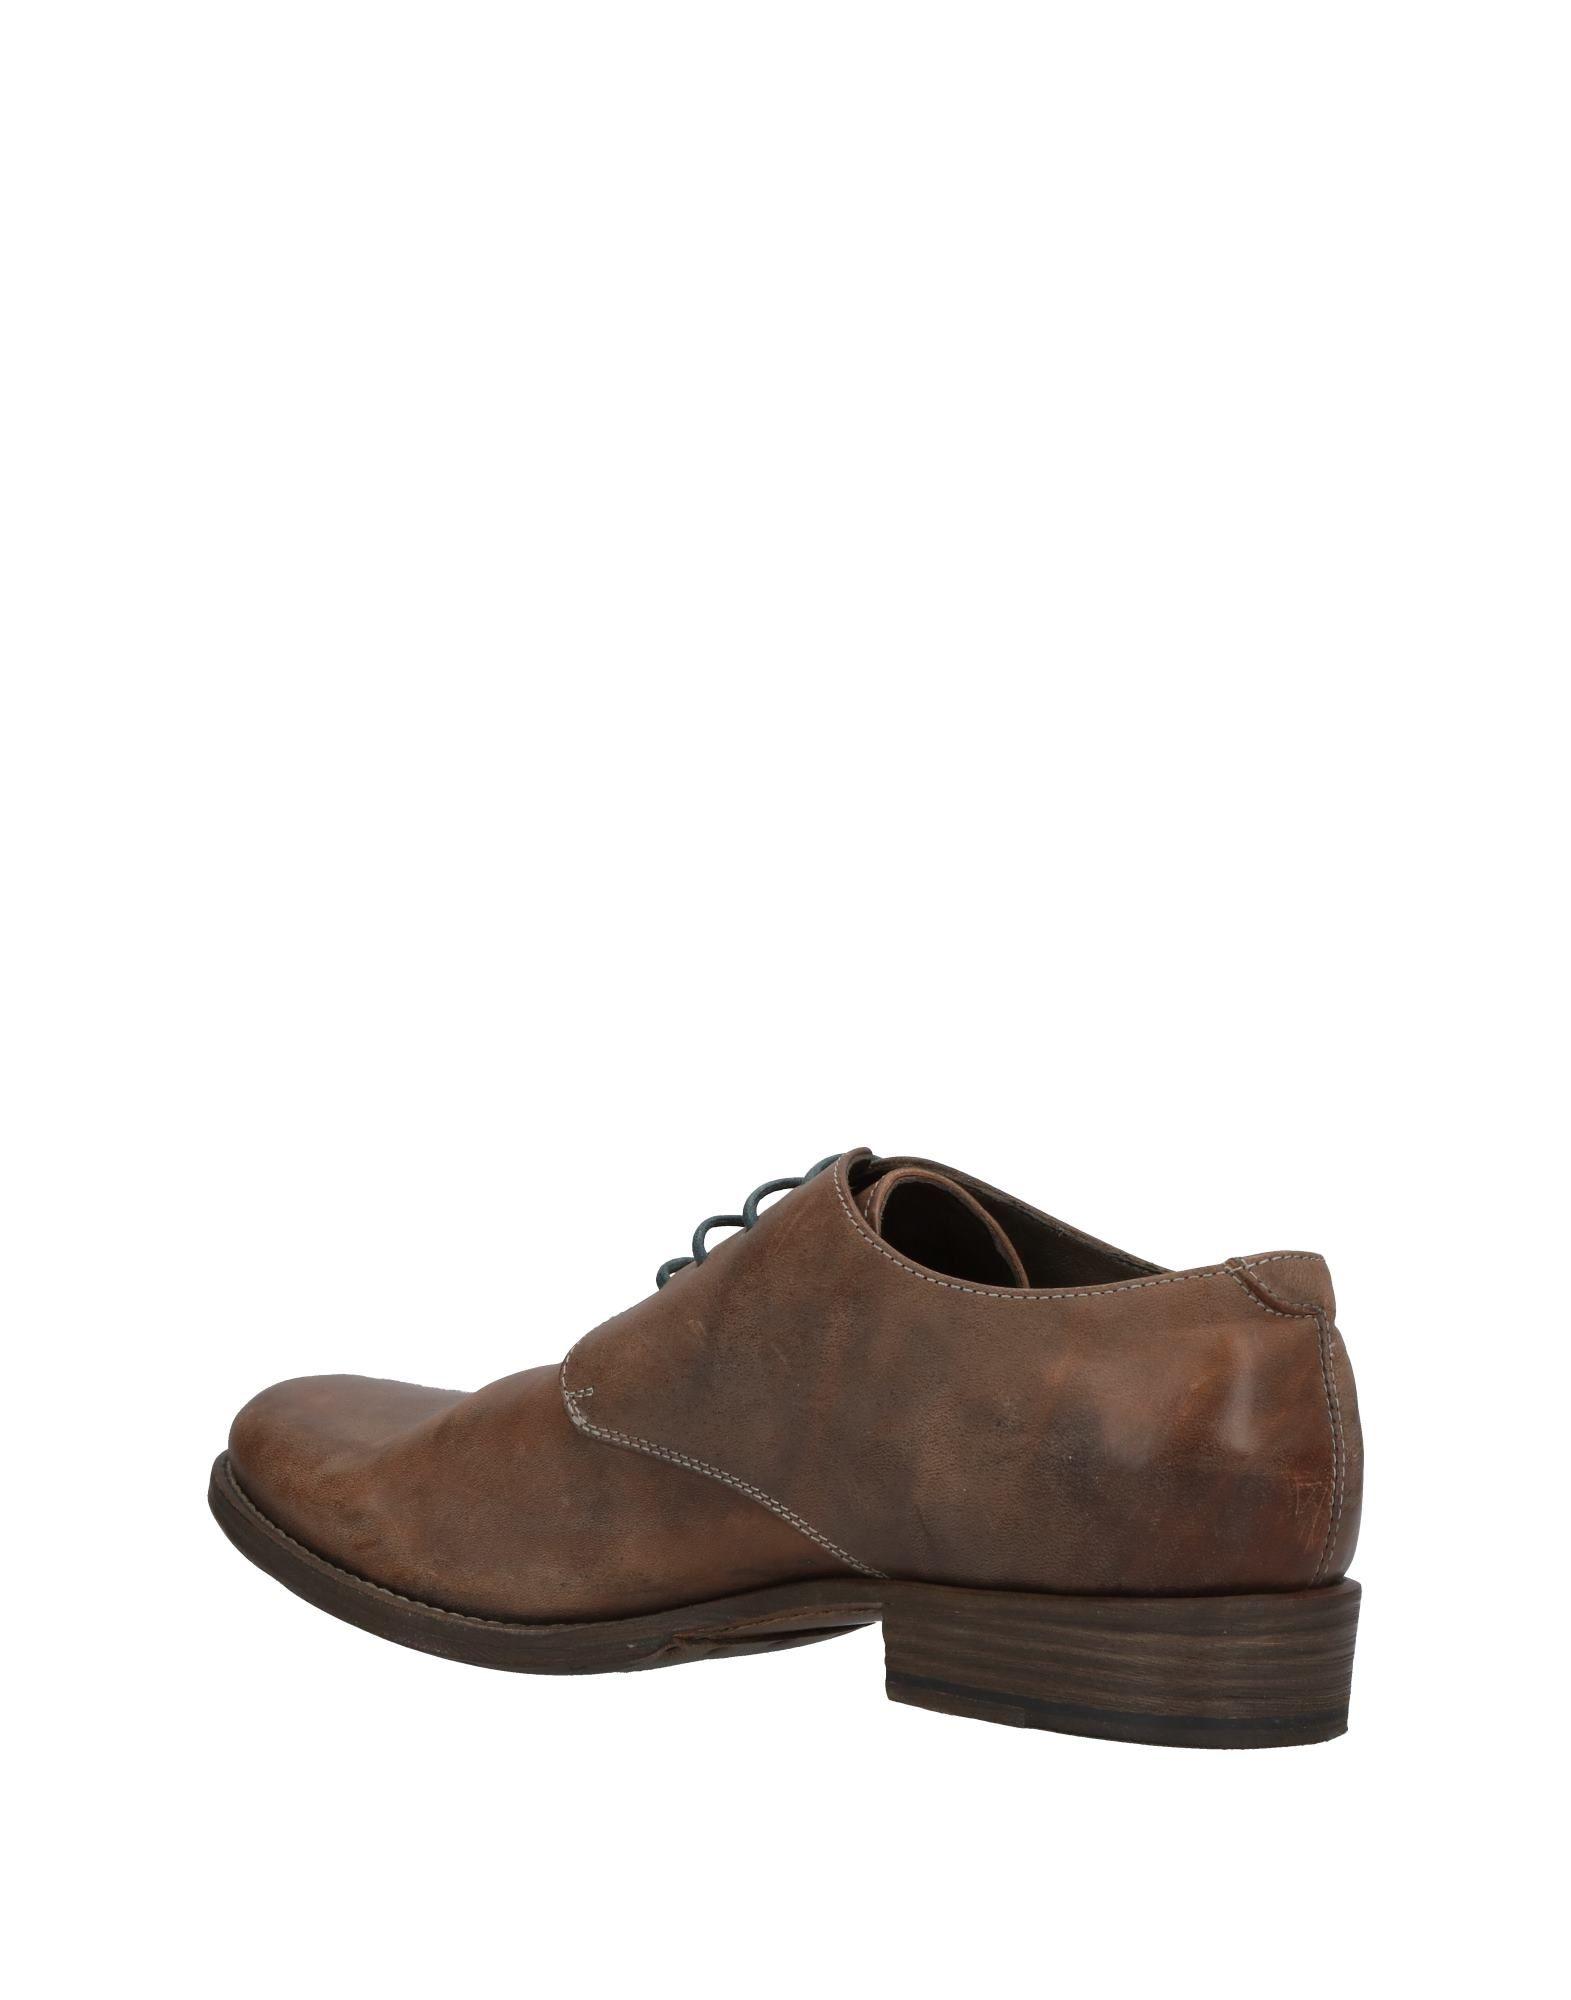 Chaussures À Lacets Giorgio Brato Homme - Chaussures À Lacets Giorgio Brato sur